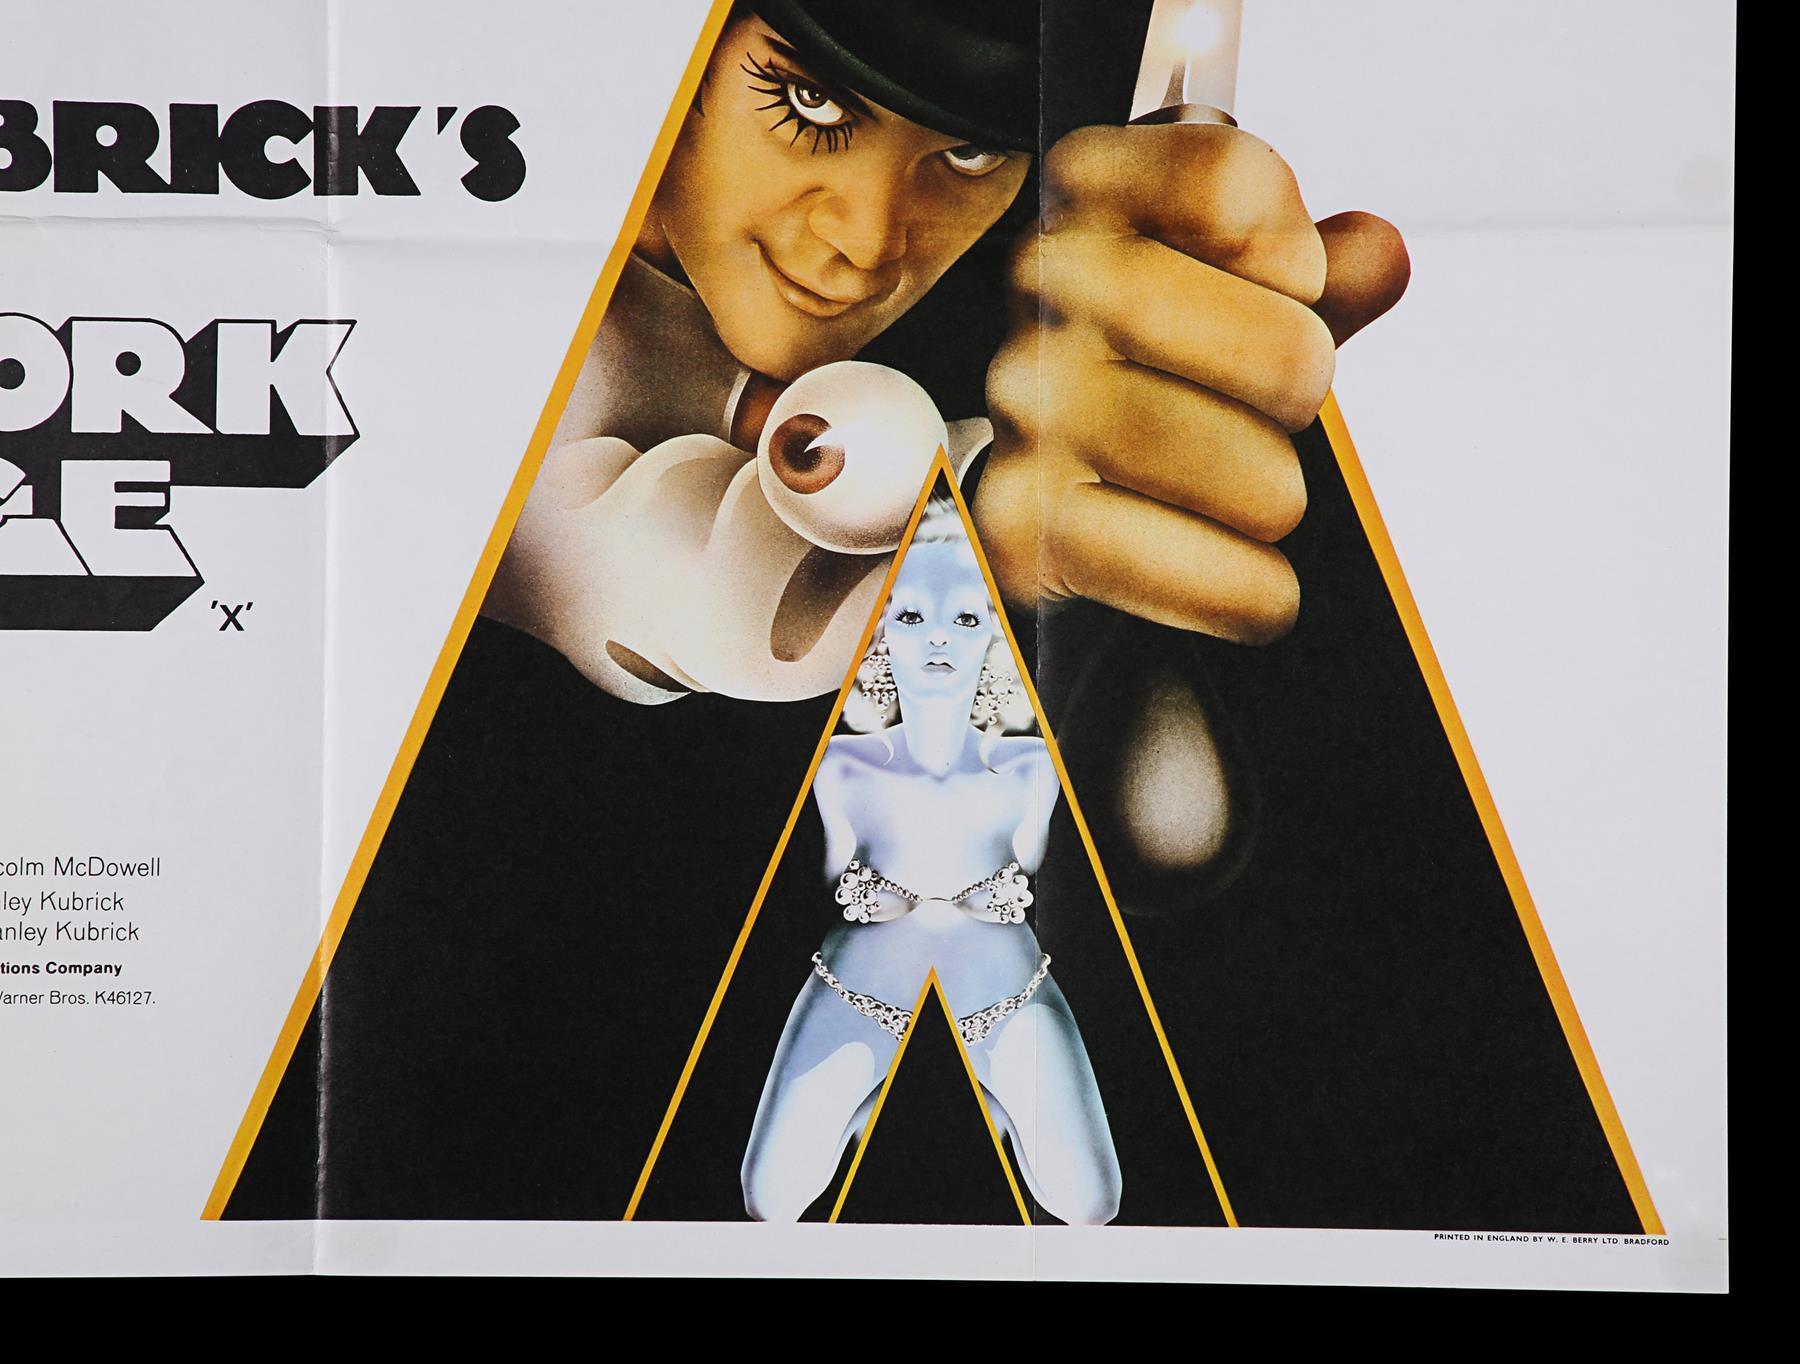 A CLOCKWORK ORANGE (1971) - UK Quad, 1971 - Image 4 of 6